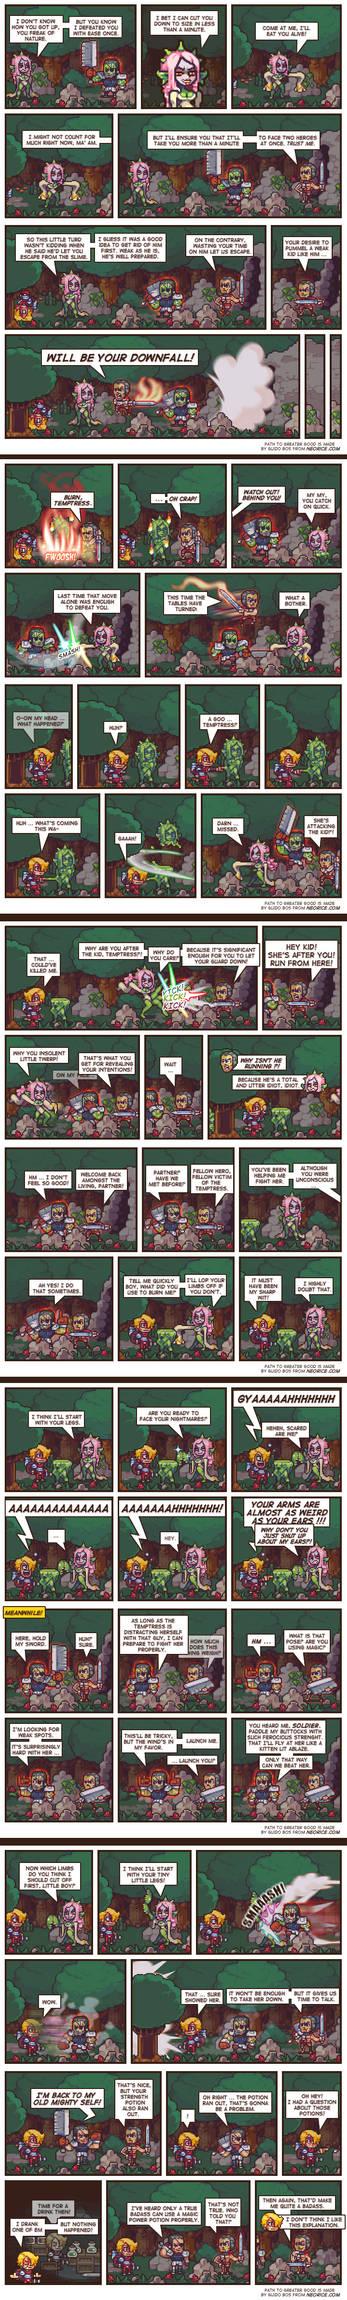 TOM RPG page 71-80